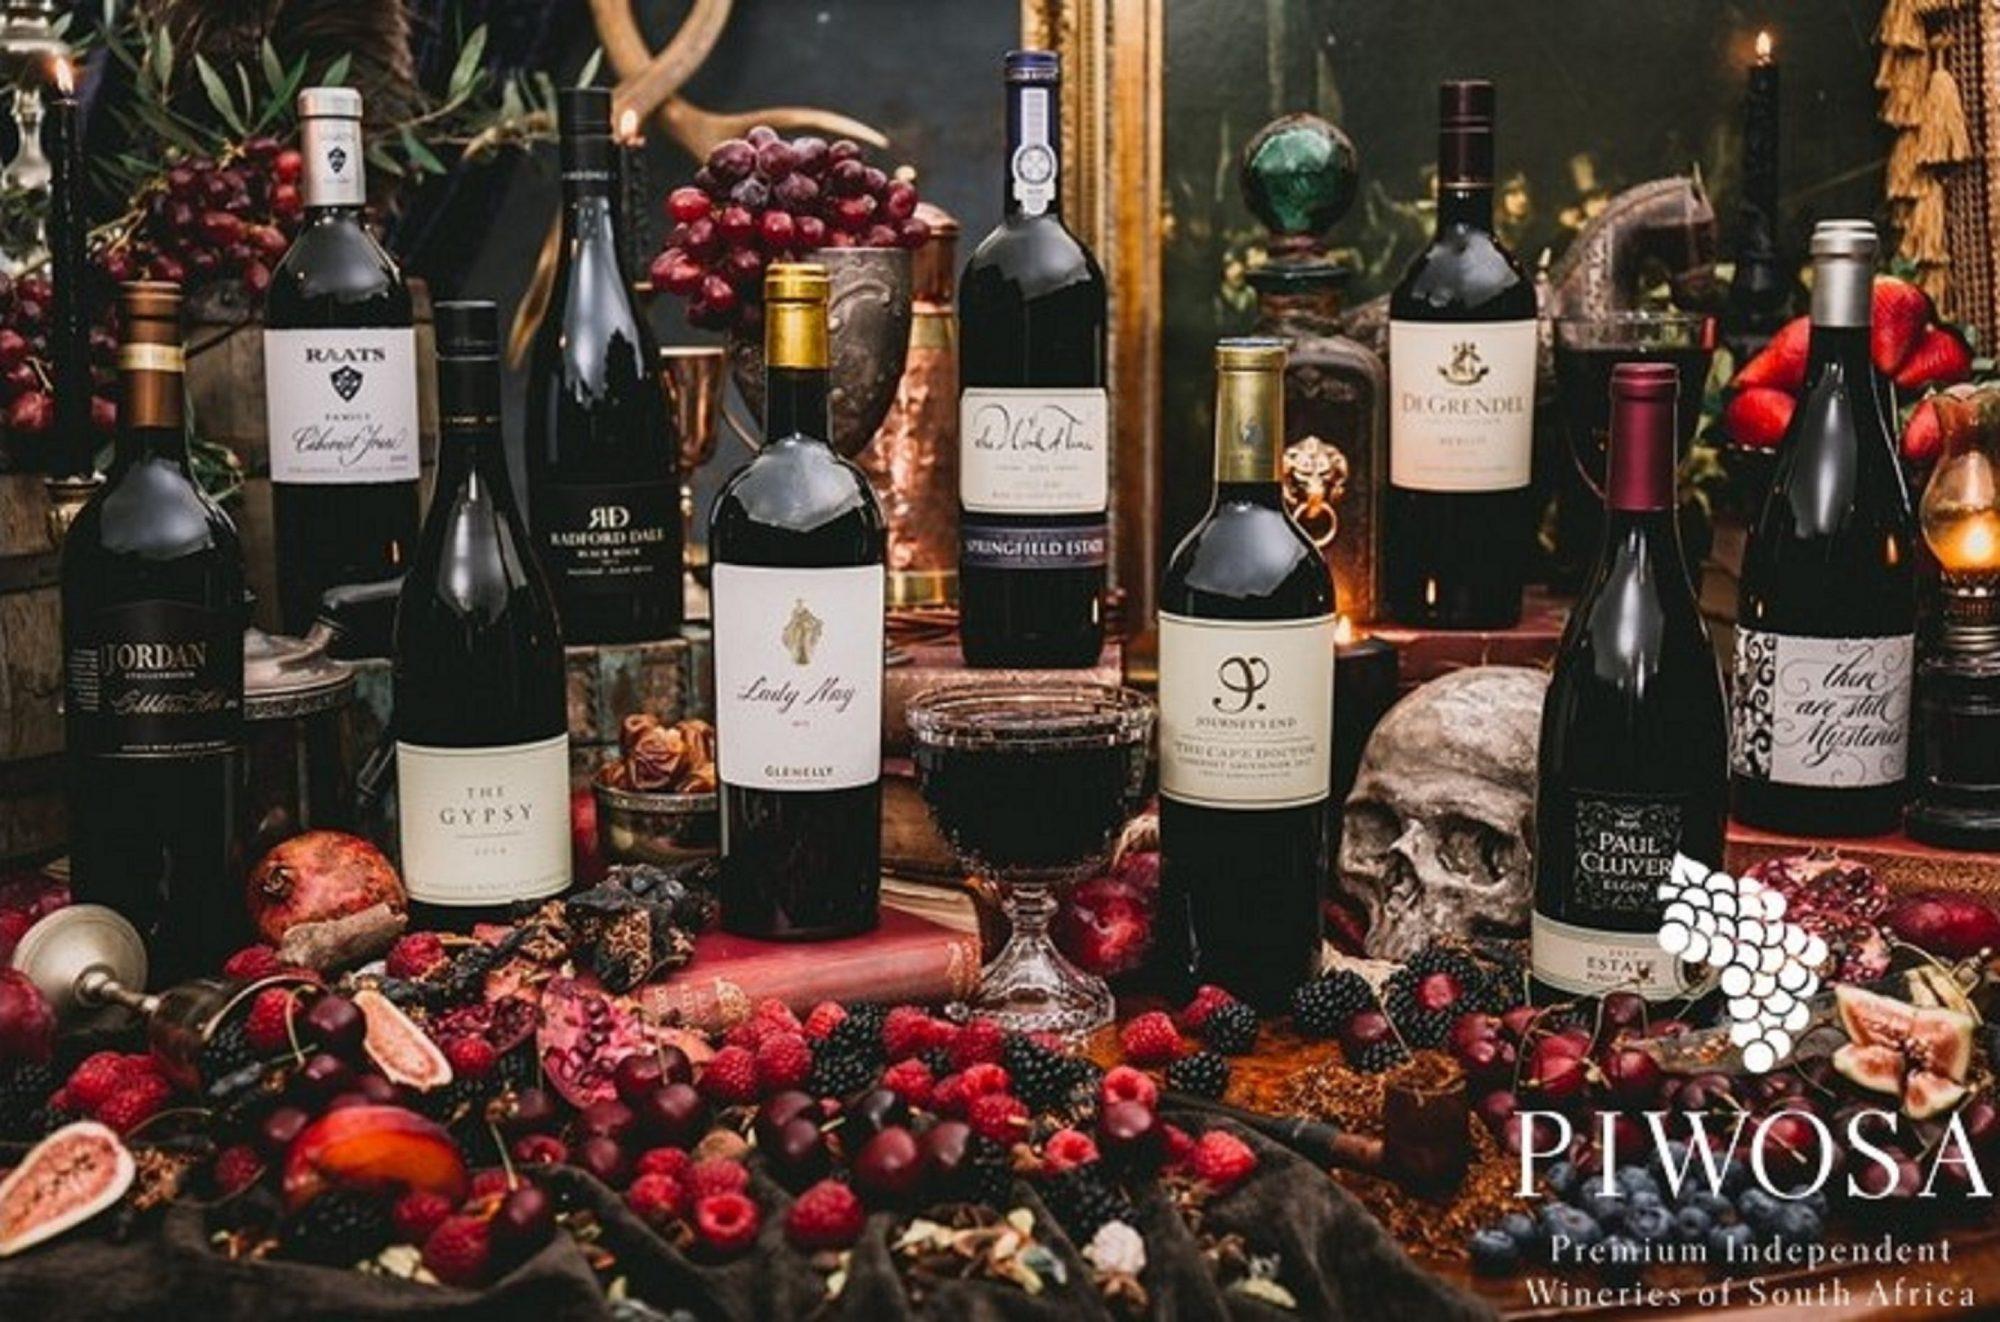 {NEWS}{MEDIA RELEASE} INTRODUCING PIWOSA'S #LIQUIDART PROGRAMME DURING CAPE WINE 2018